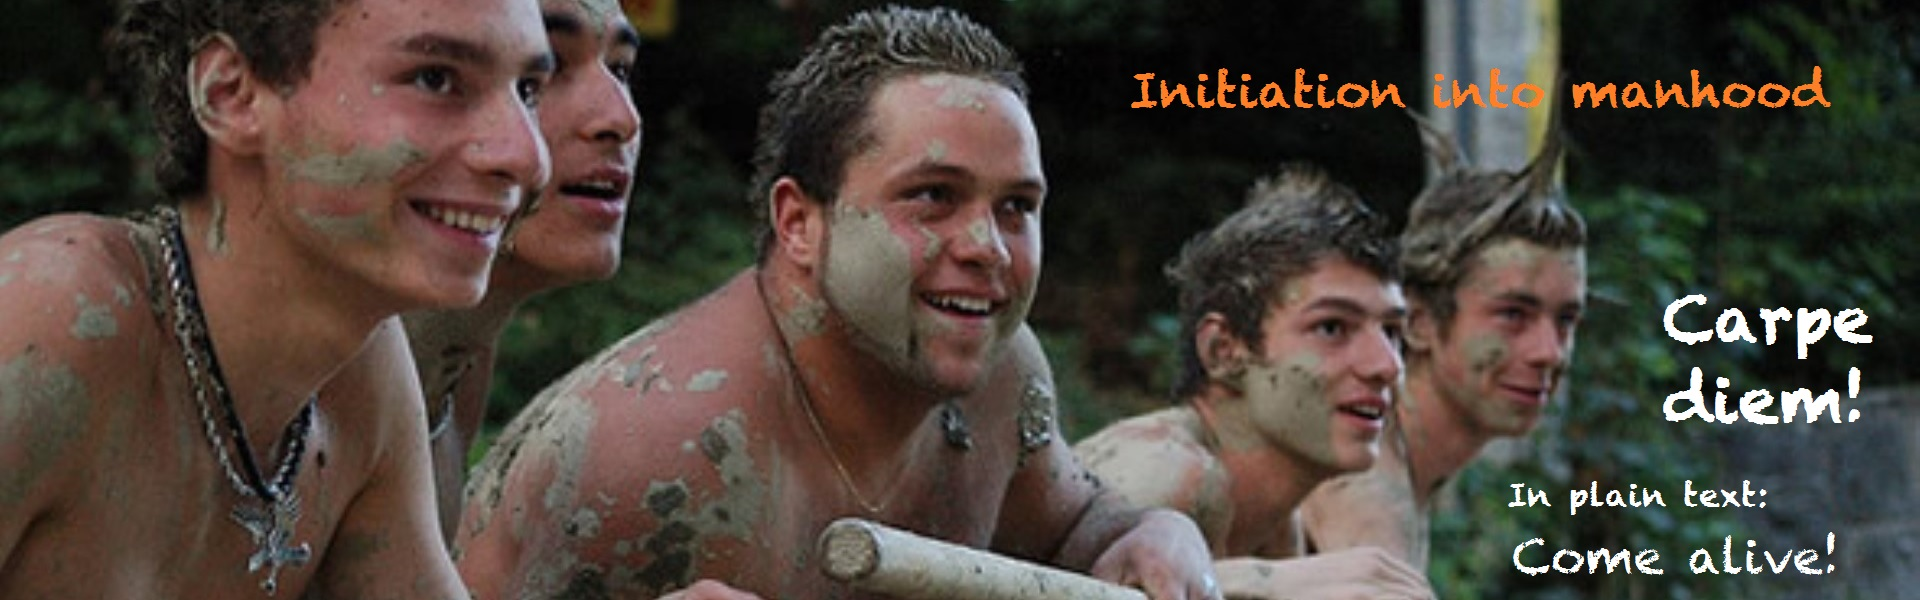 Initiation_junge_Männer2.jpg